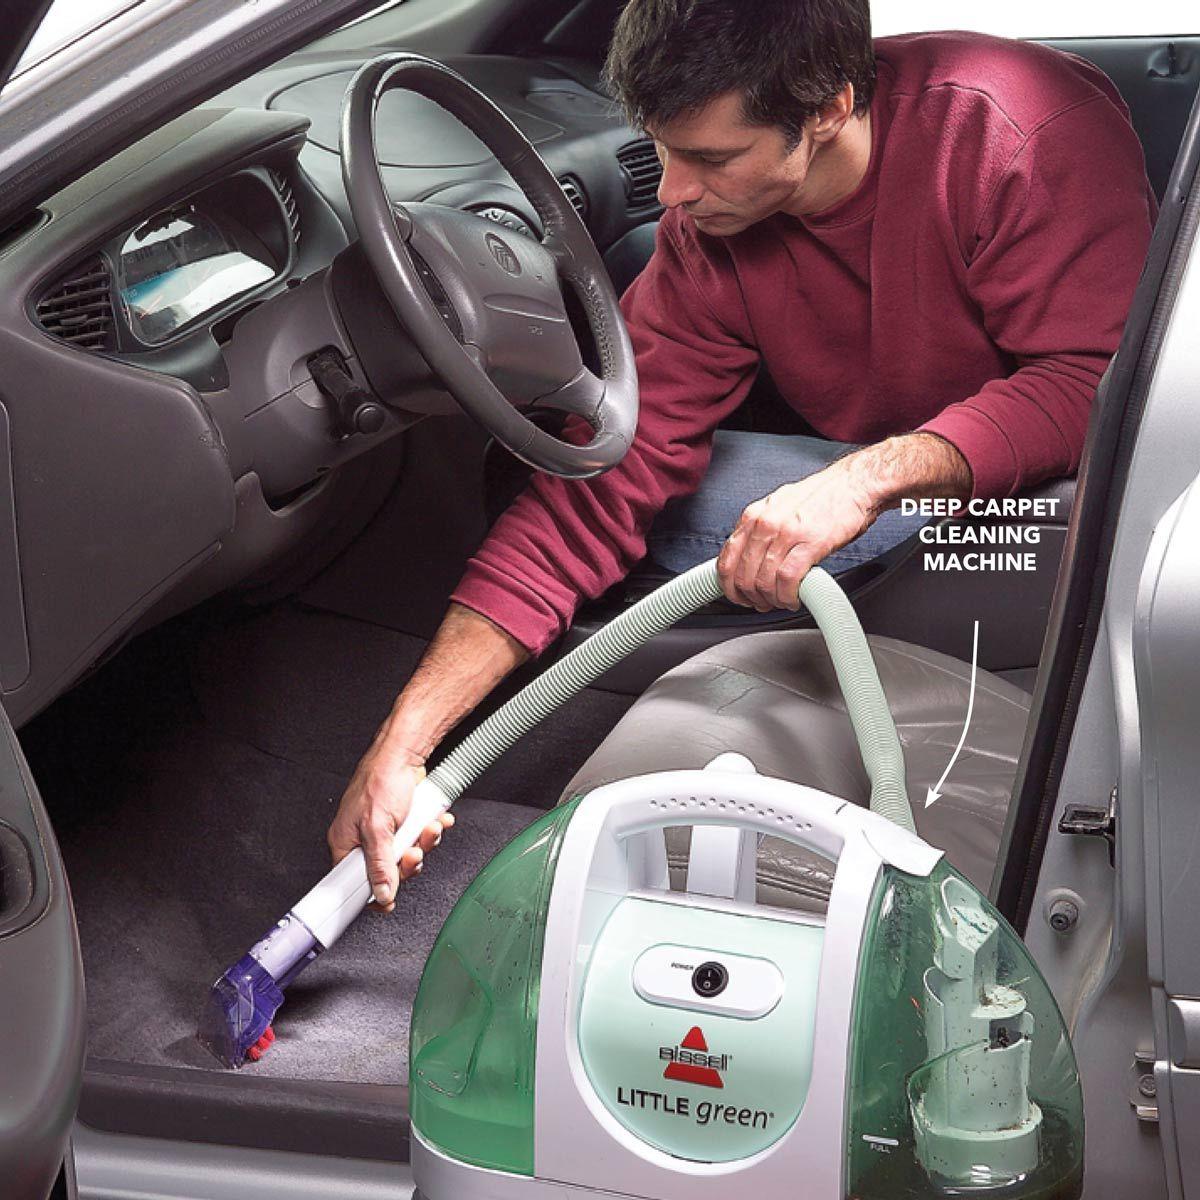 46 Diy Car Detailing Tips That Will